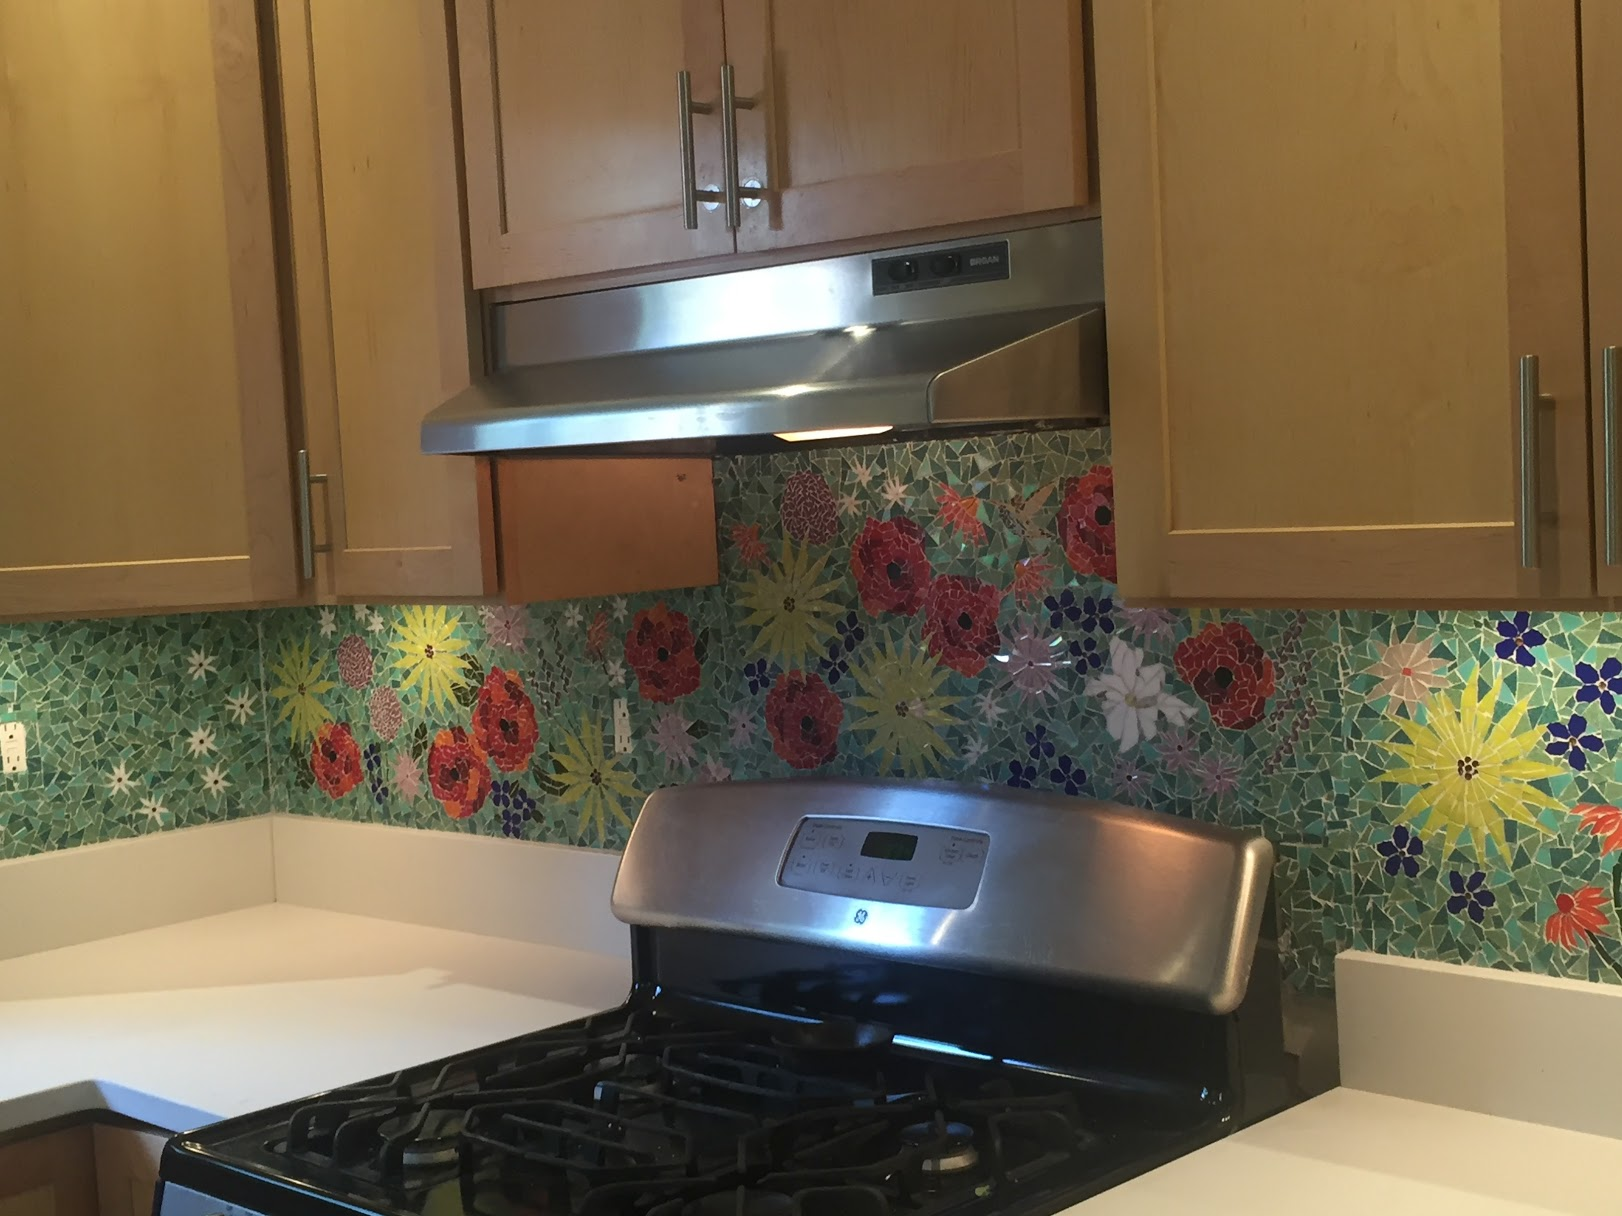 Kitchen backsplash with Venetian tile